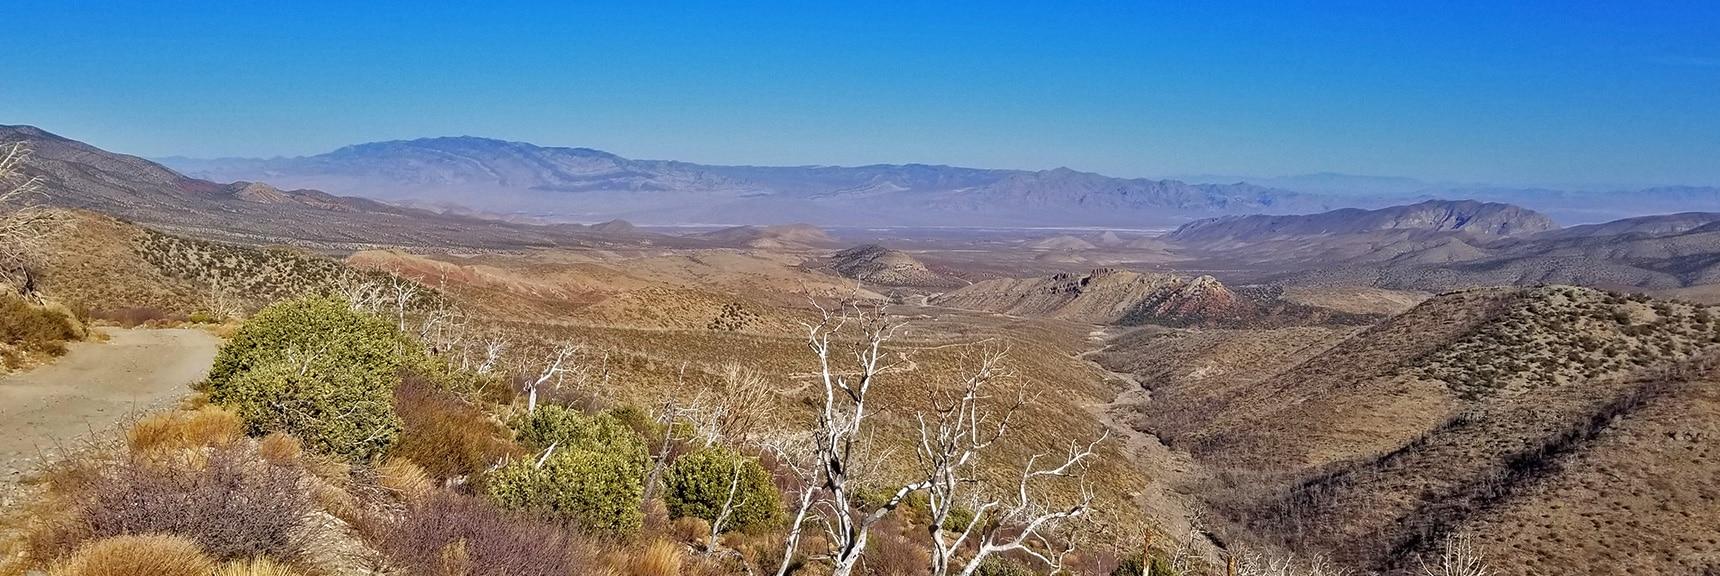 View Down Canyon Toward Sheep Range & Gass Peak from 7,000ft on Harris Mt. Rd.  Harris Springs Rd, Harris Mountain Rd   Spring Mountains Wilderness, Nevada